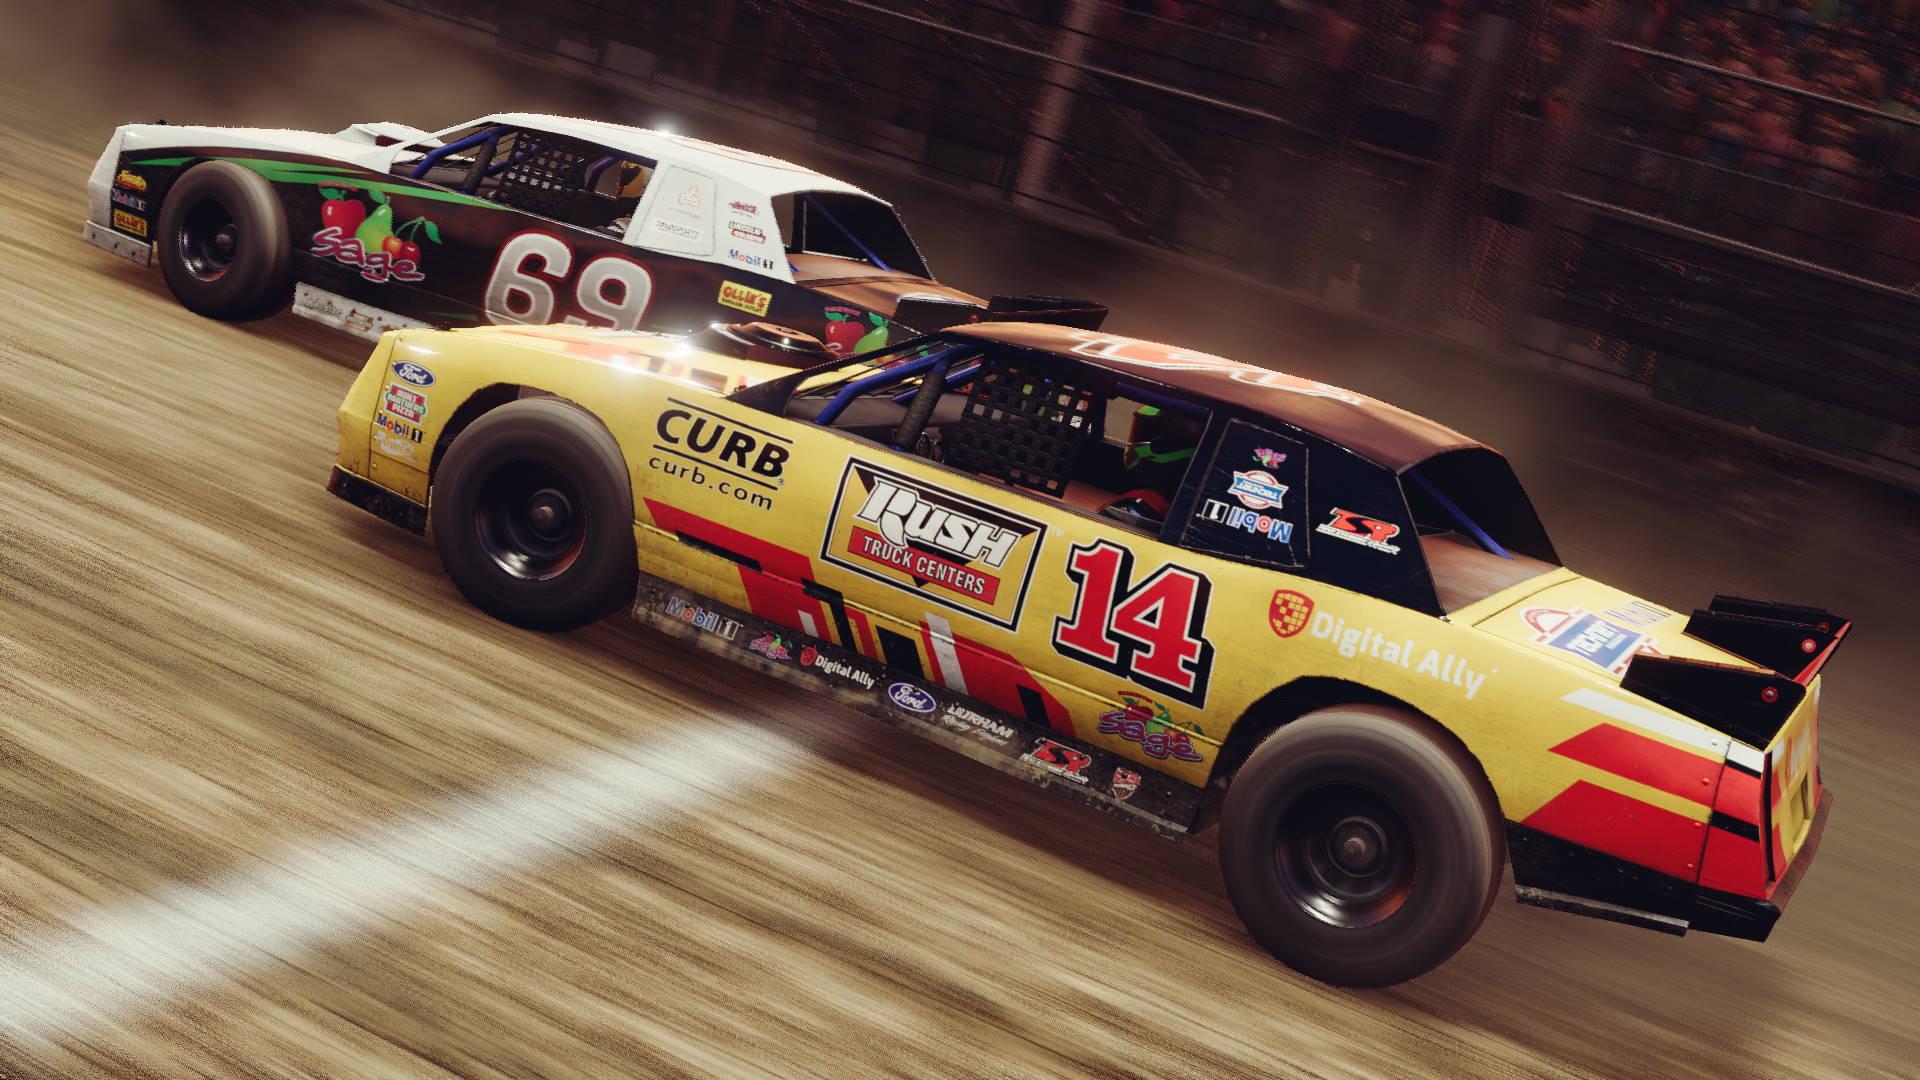 Tony-Stewarts-All-American-Racing-2